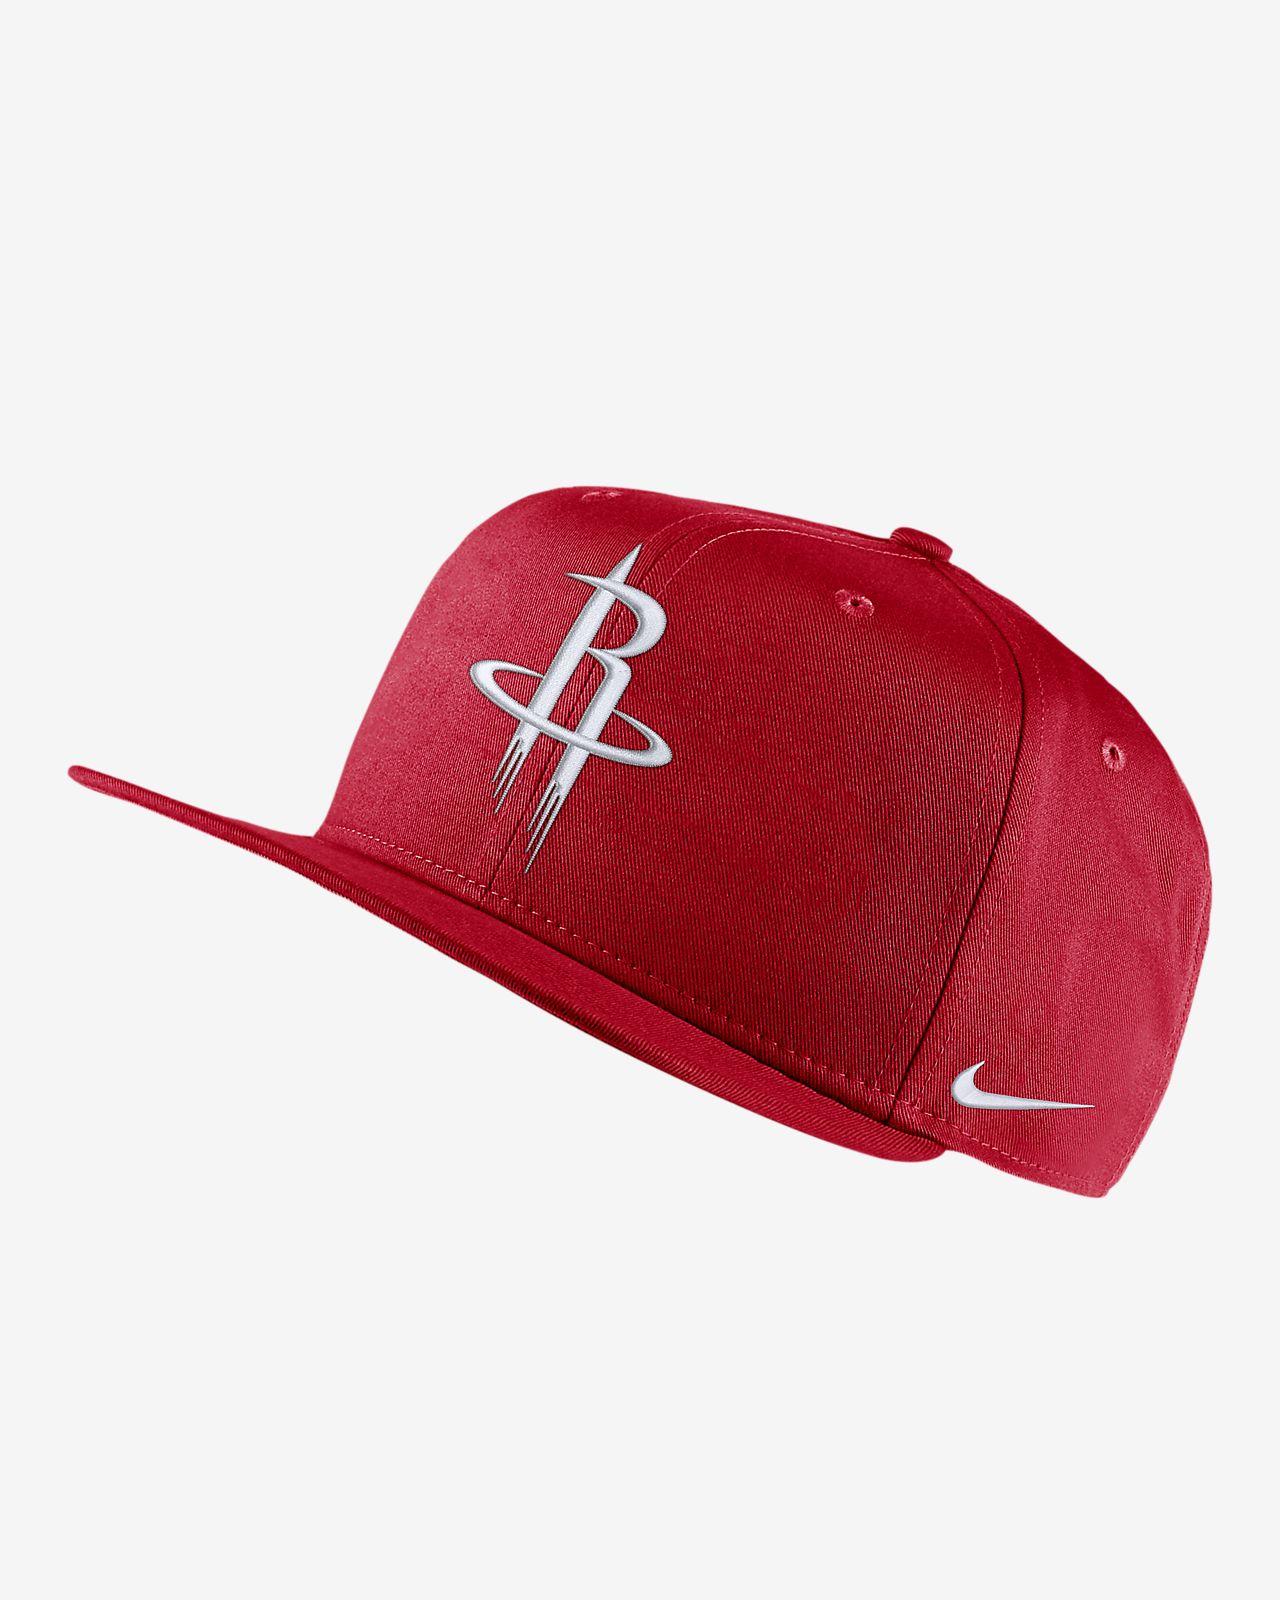 Houston Rockets Nike Pro NBA Cap